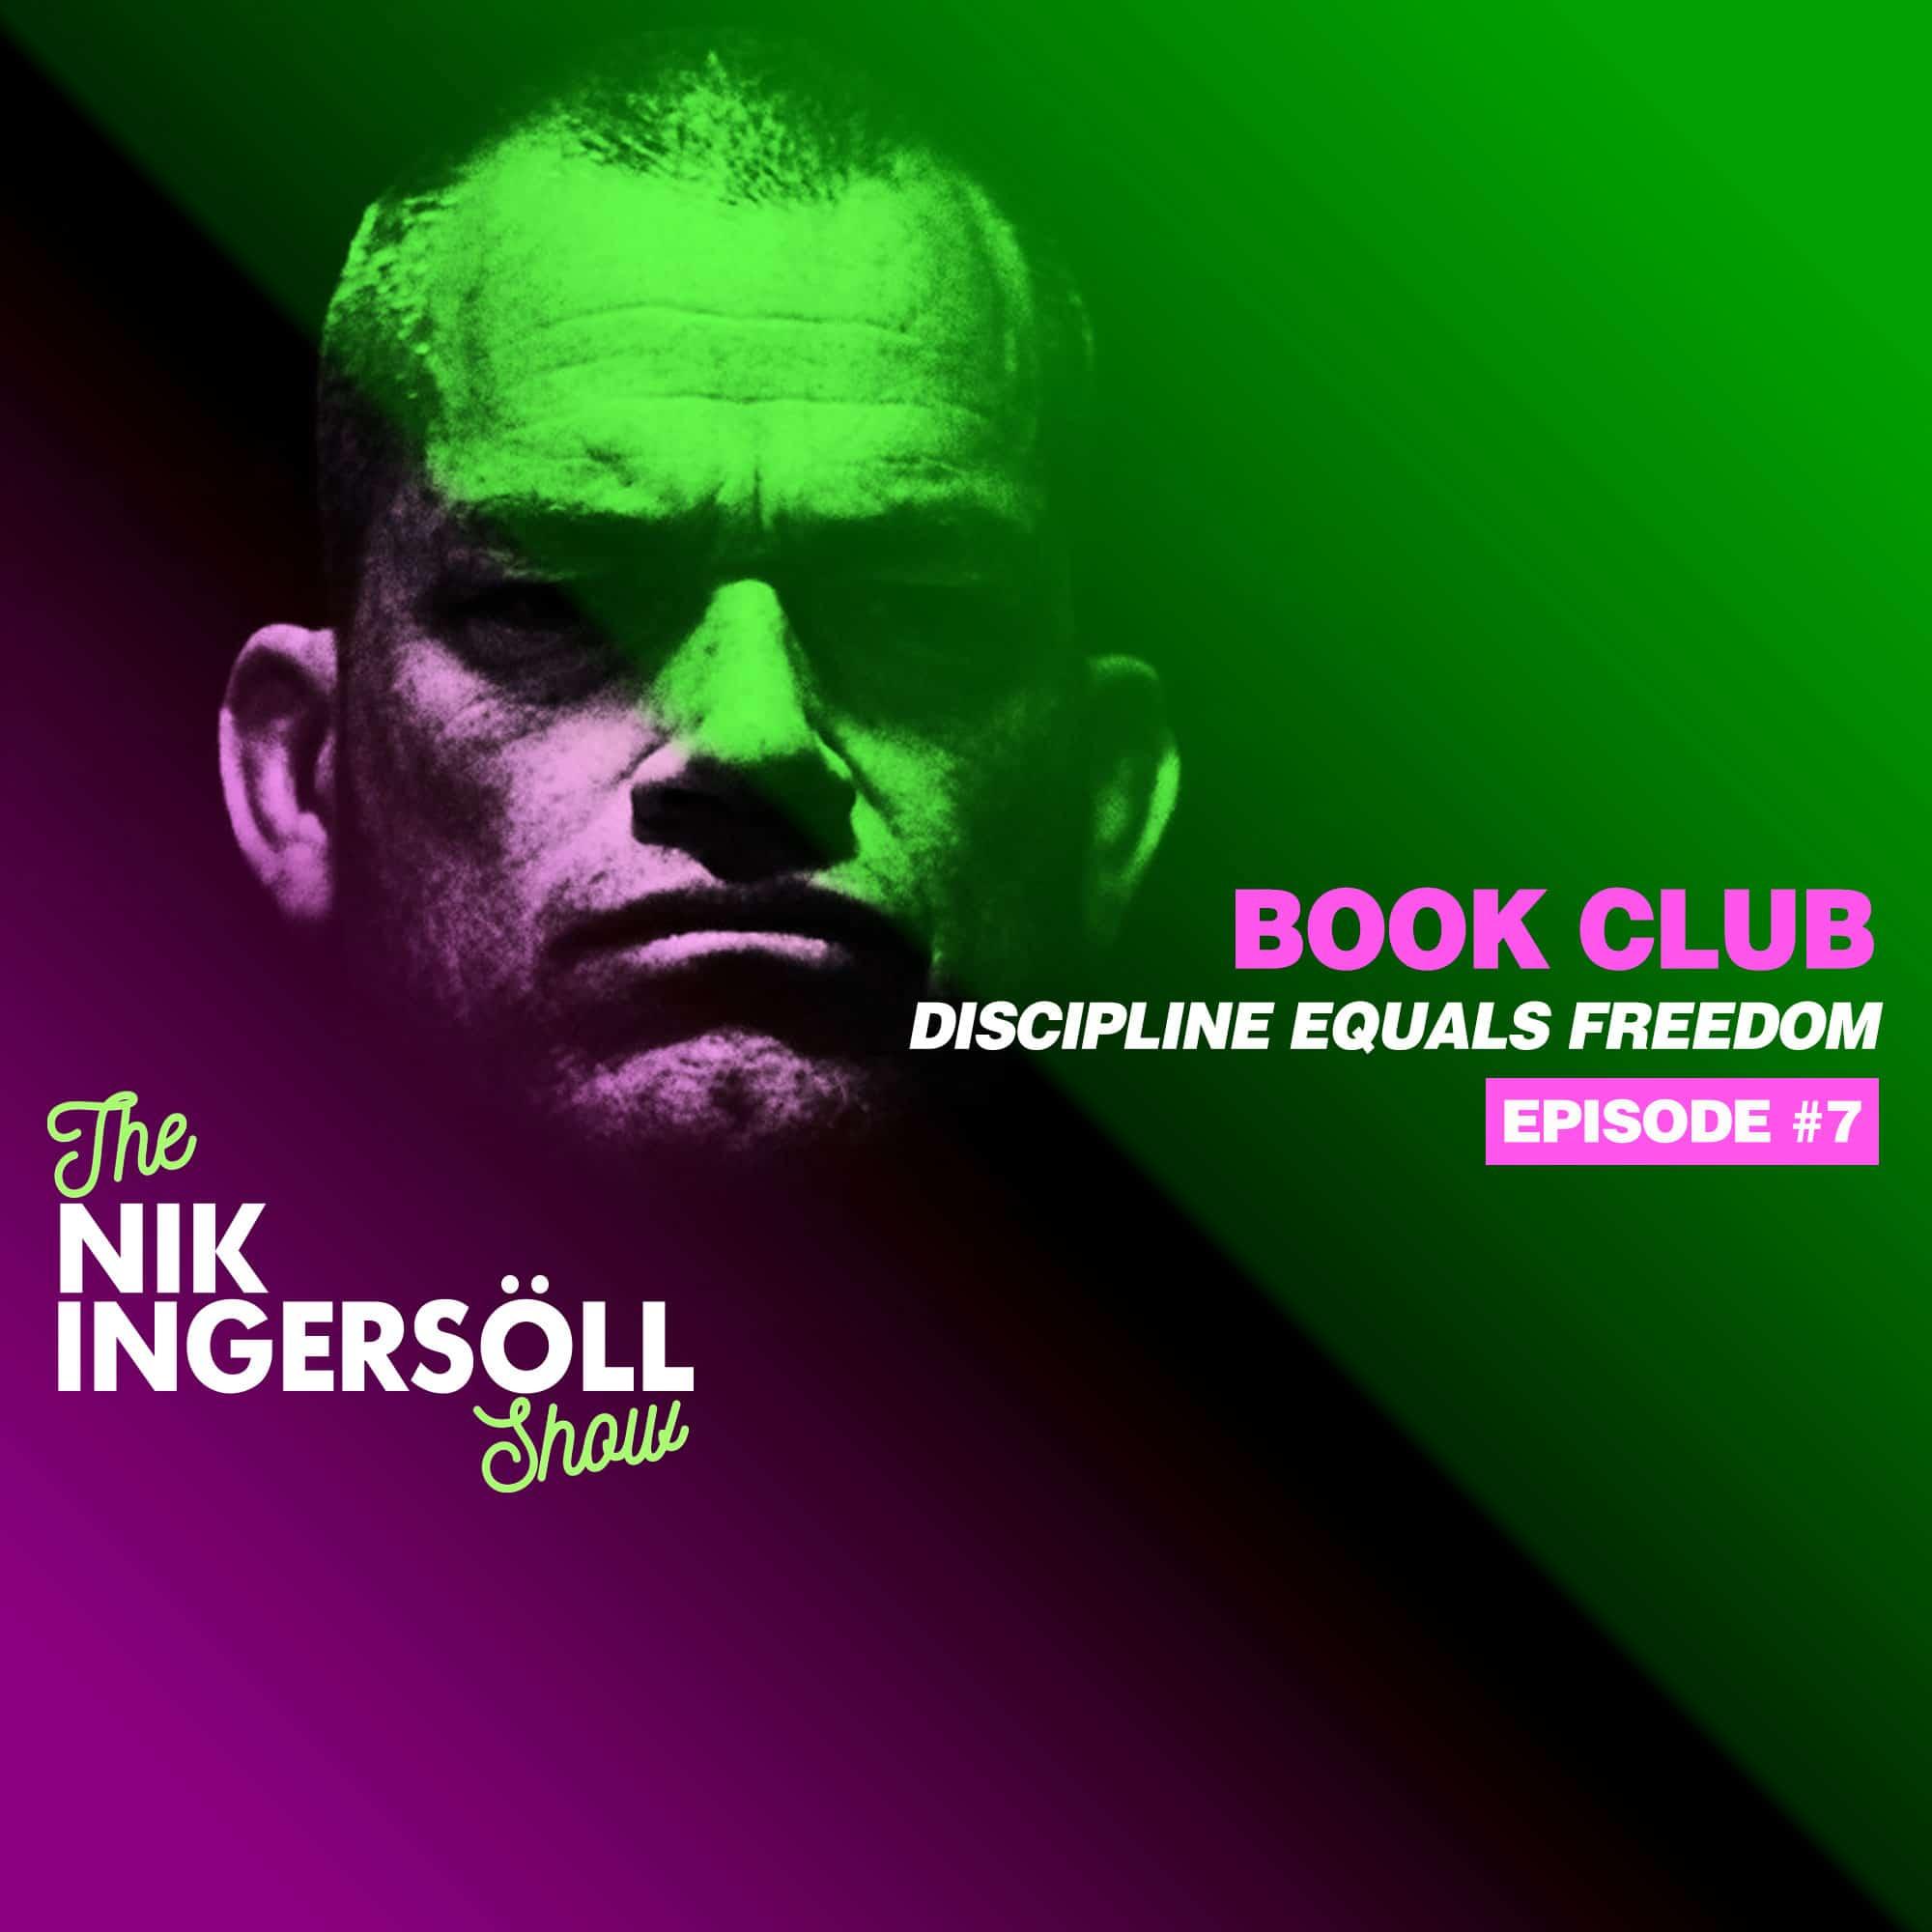 #7: BOOK CLUB – Jocko Willink – Discipline Equals Freedom (Podcast) The Nik Ingersoll Show